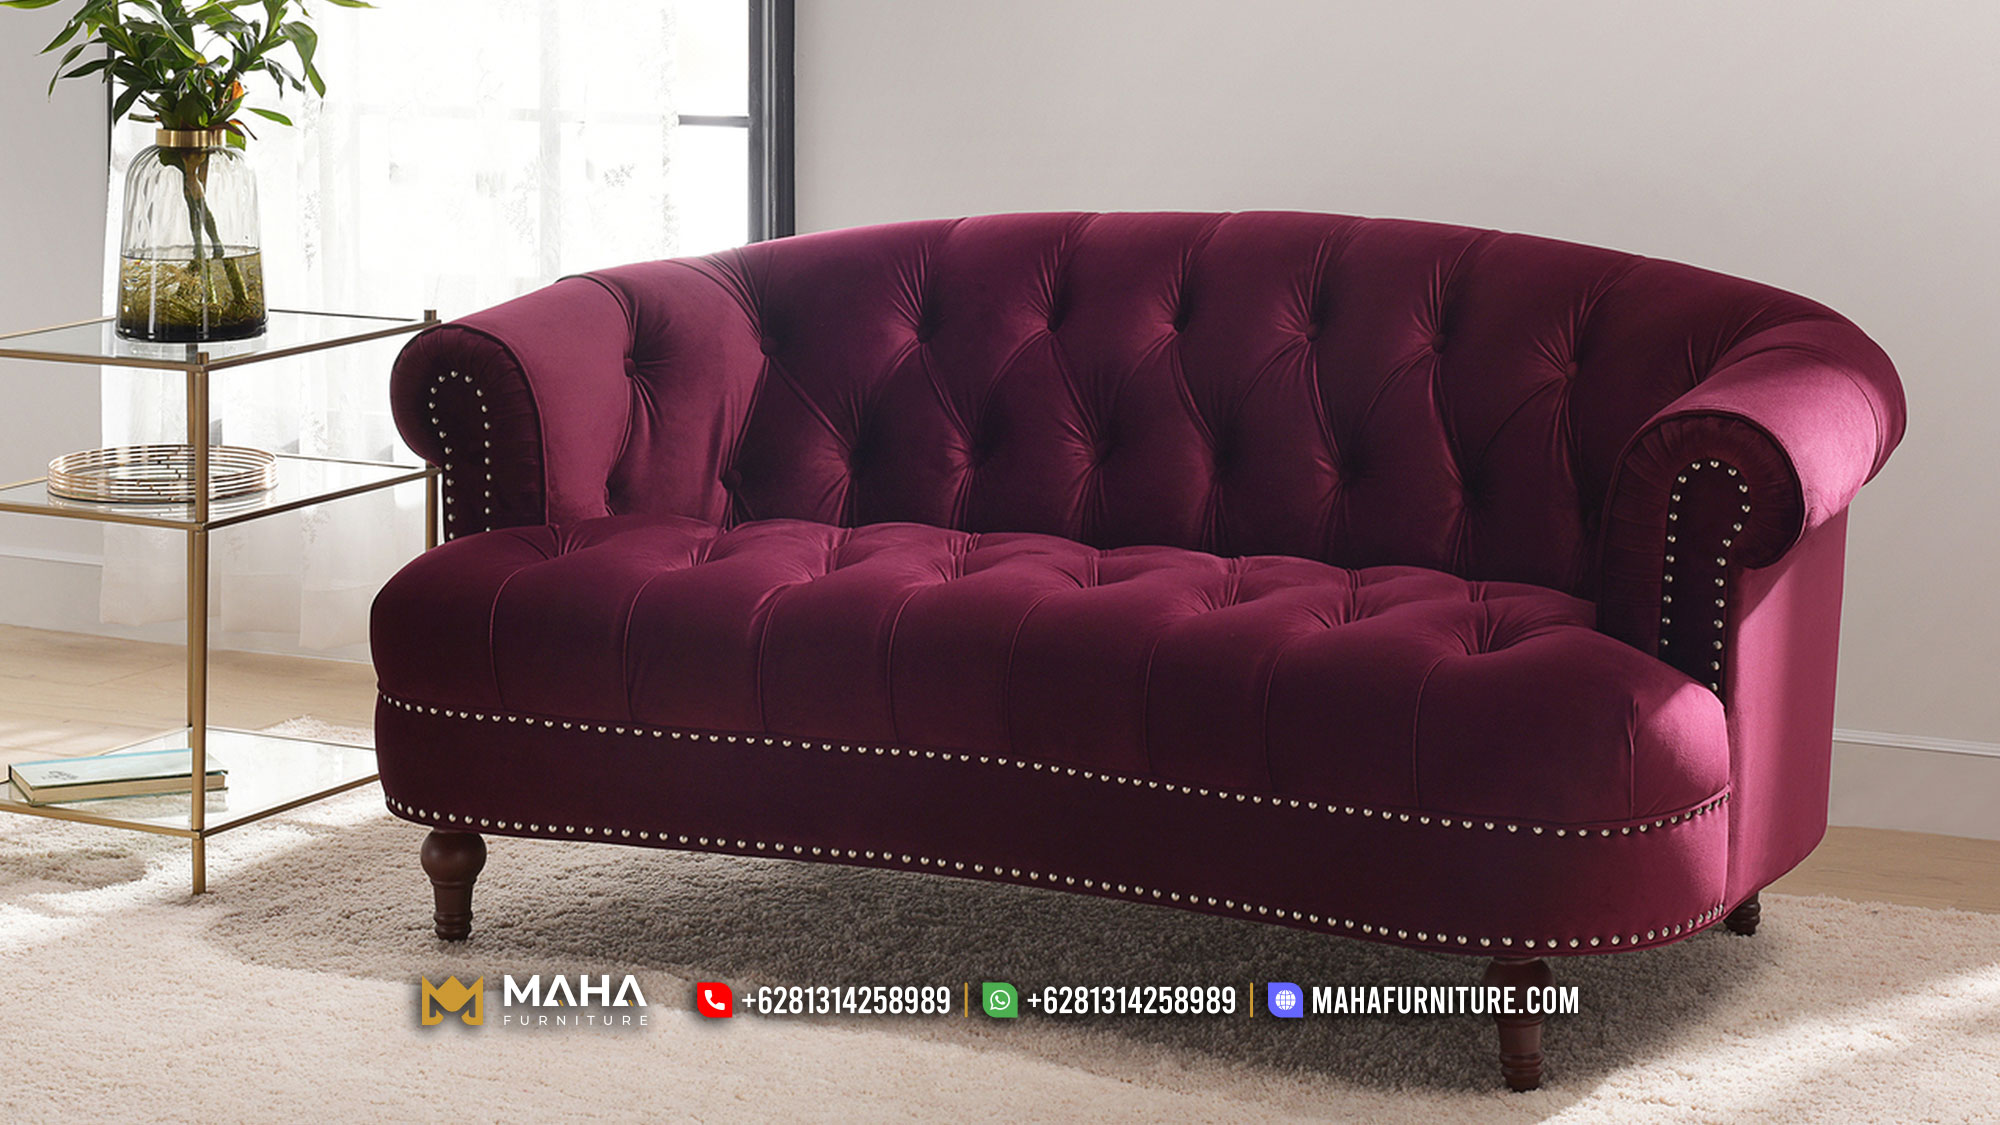 Sofa Minimalis Elegant Jepara Dreamy Magenta Color MF44